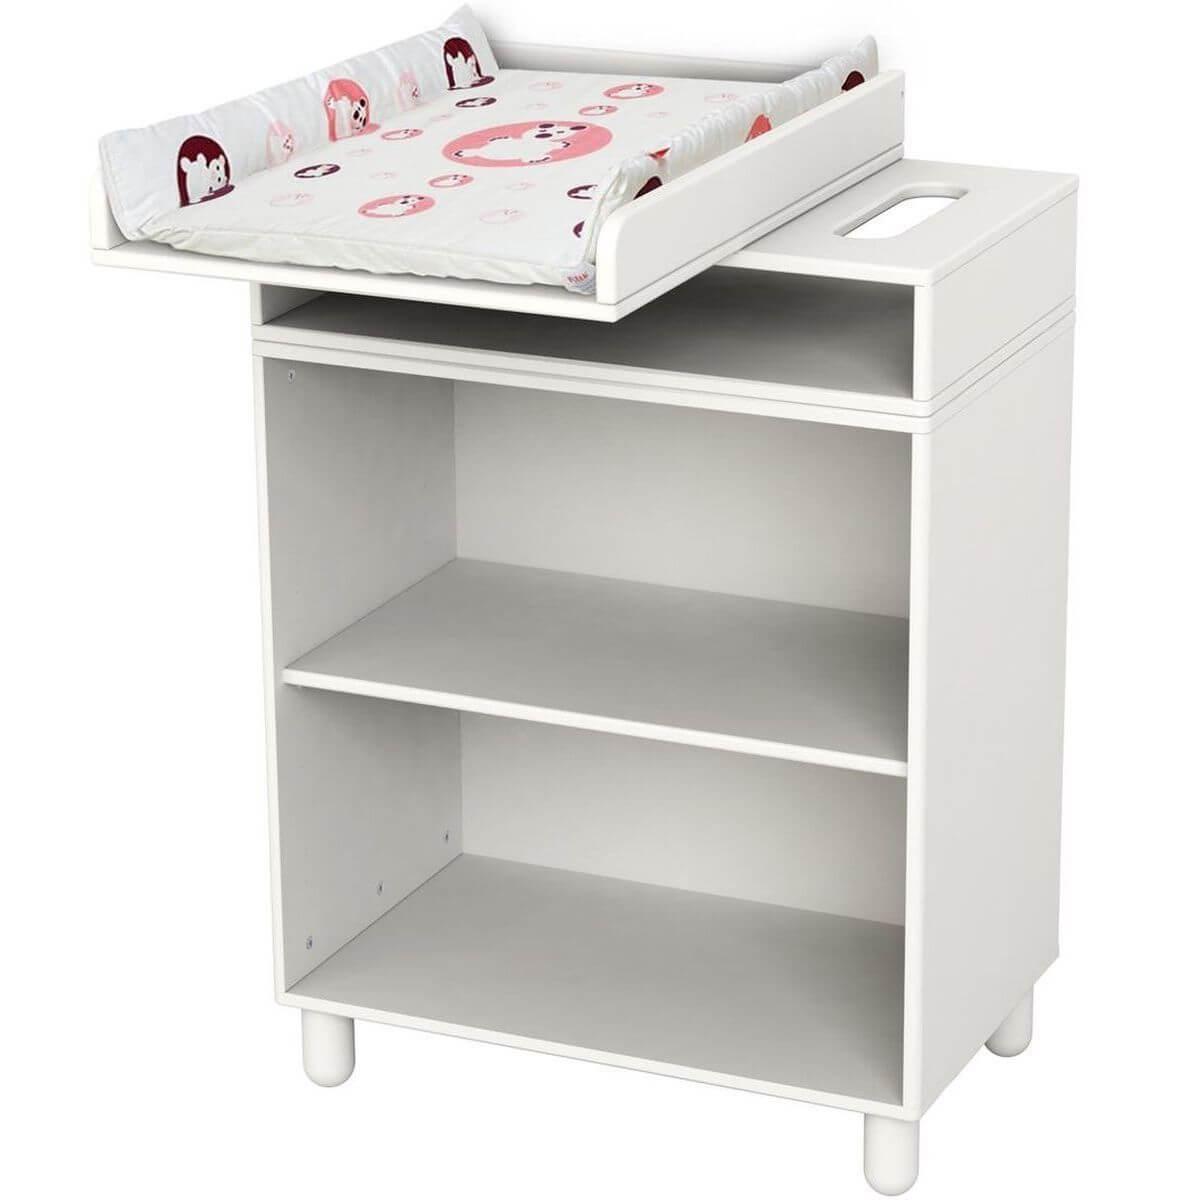 Table à langer bébé FLEXA BABY Blanc